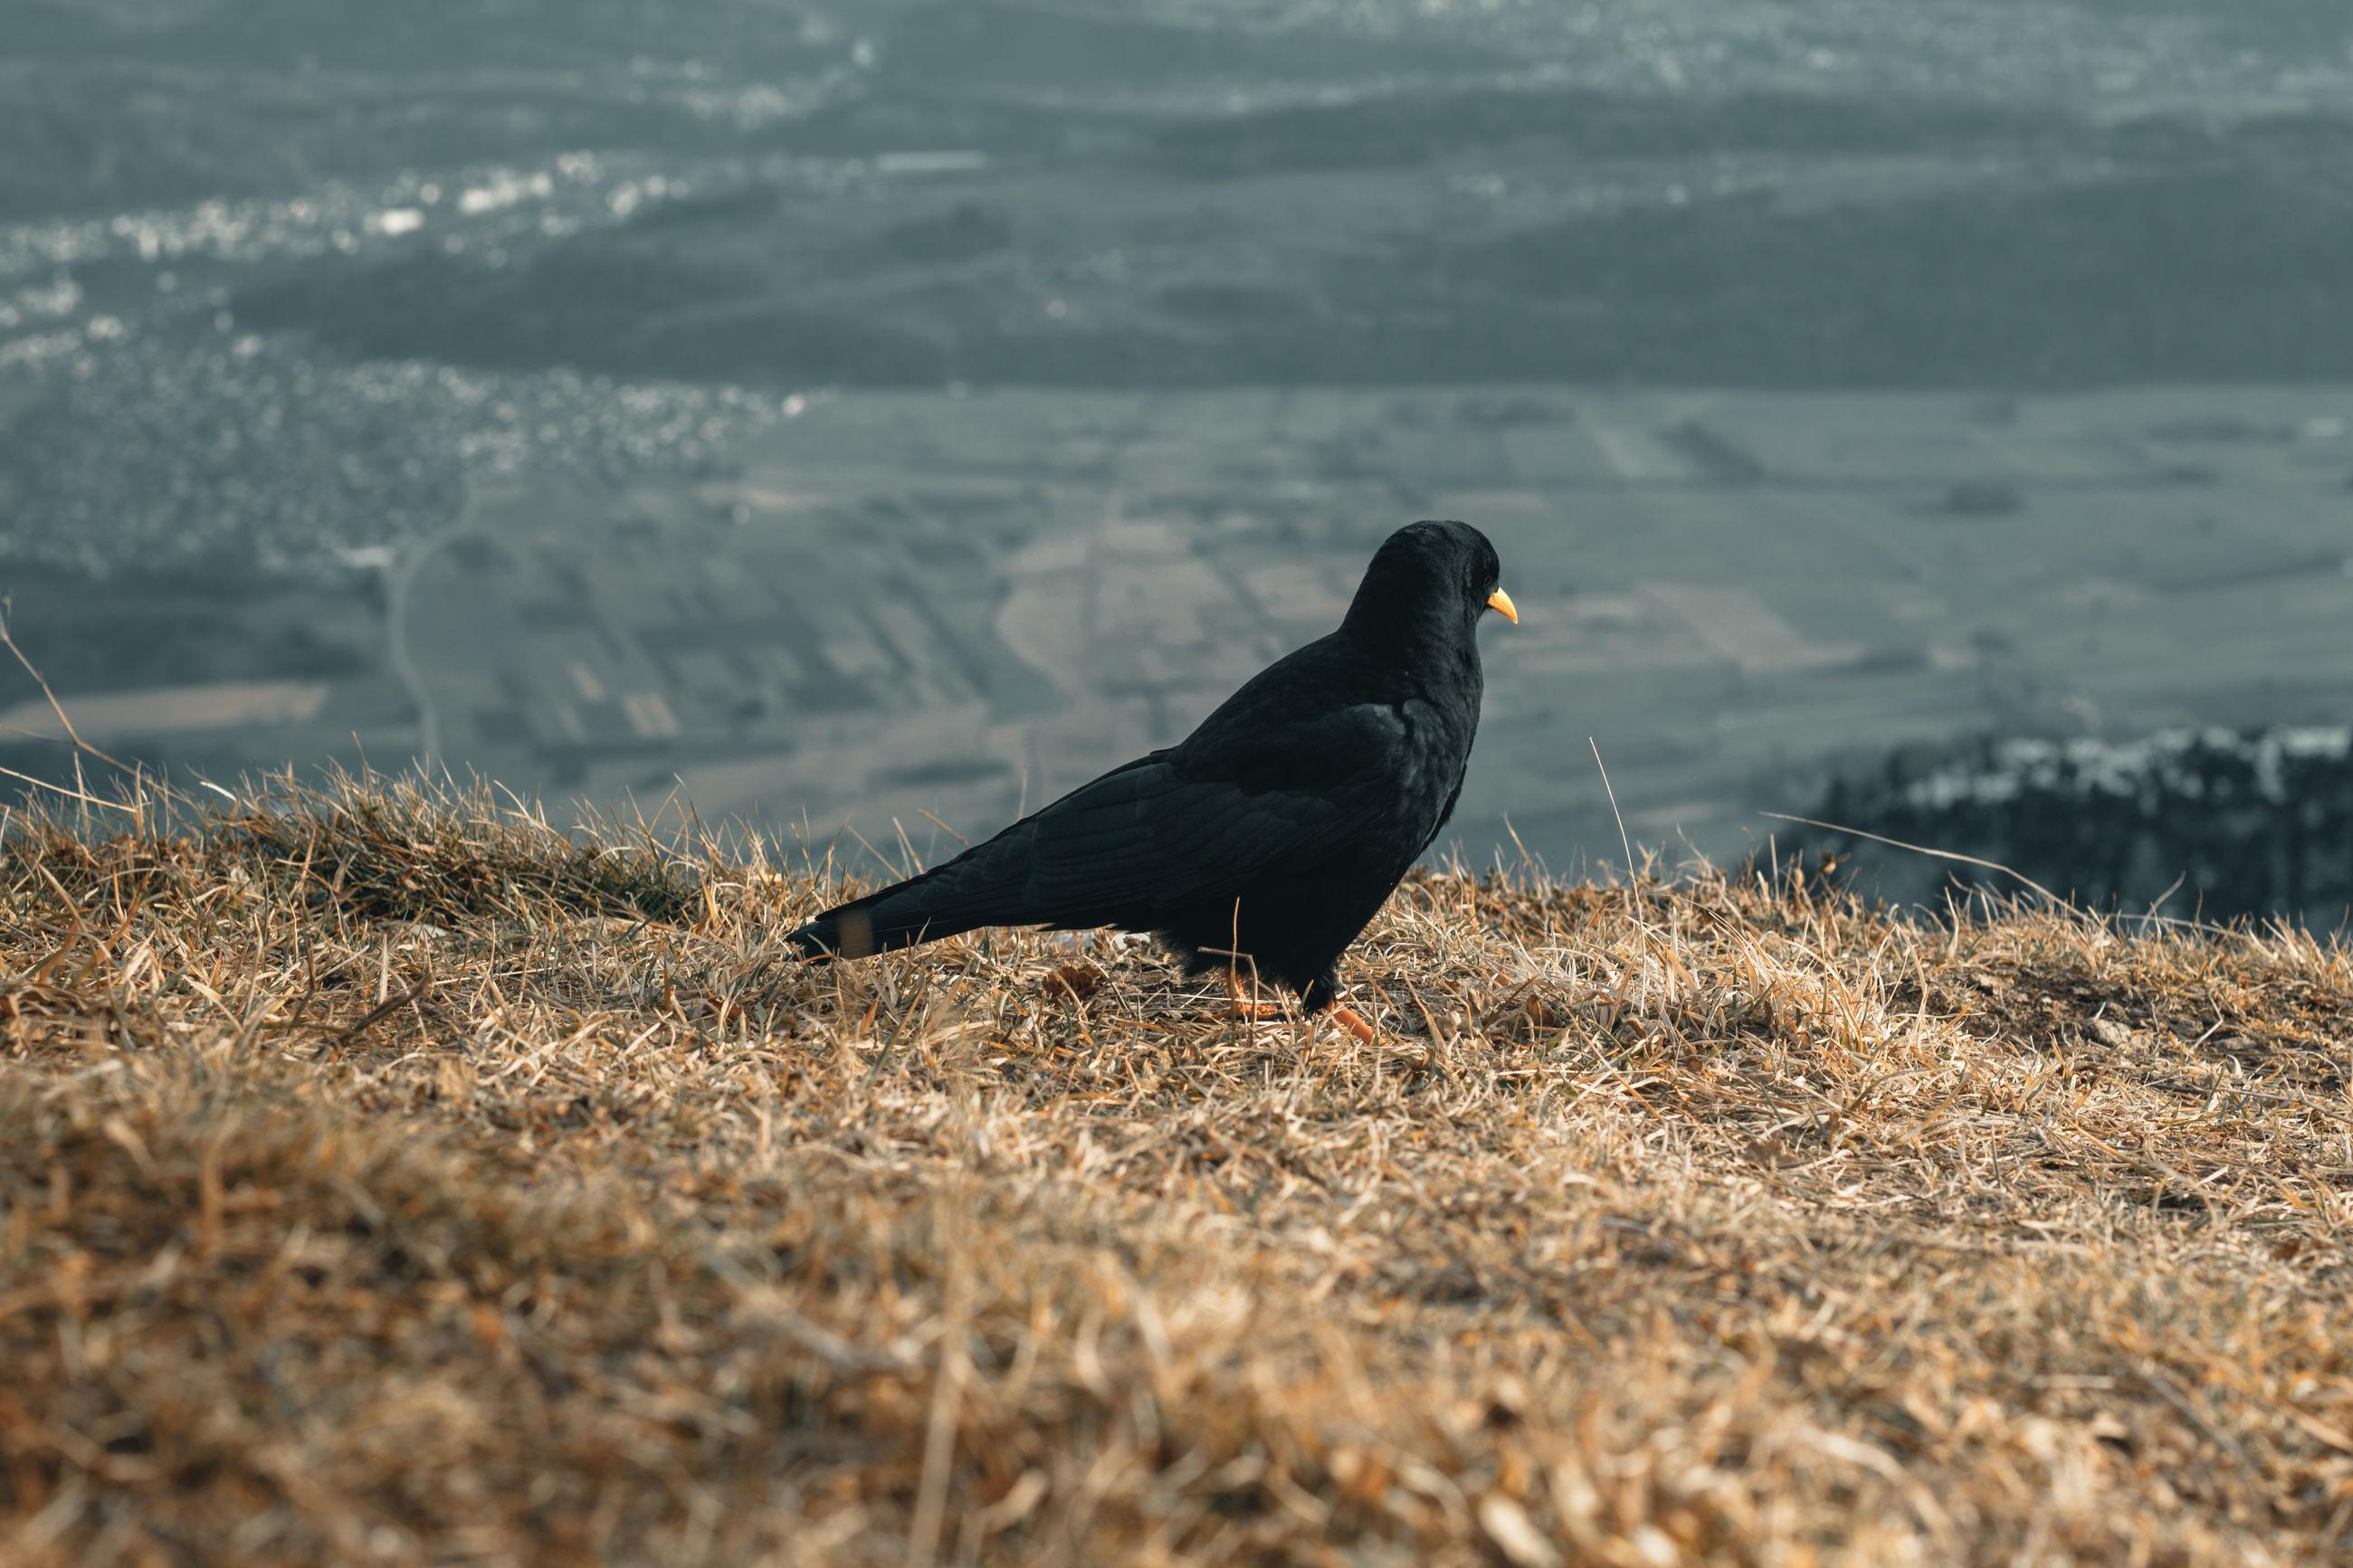 View of bird on field